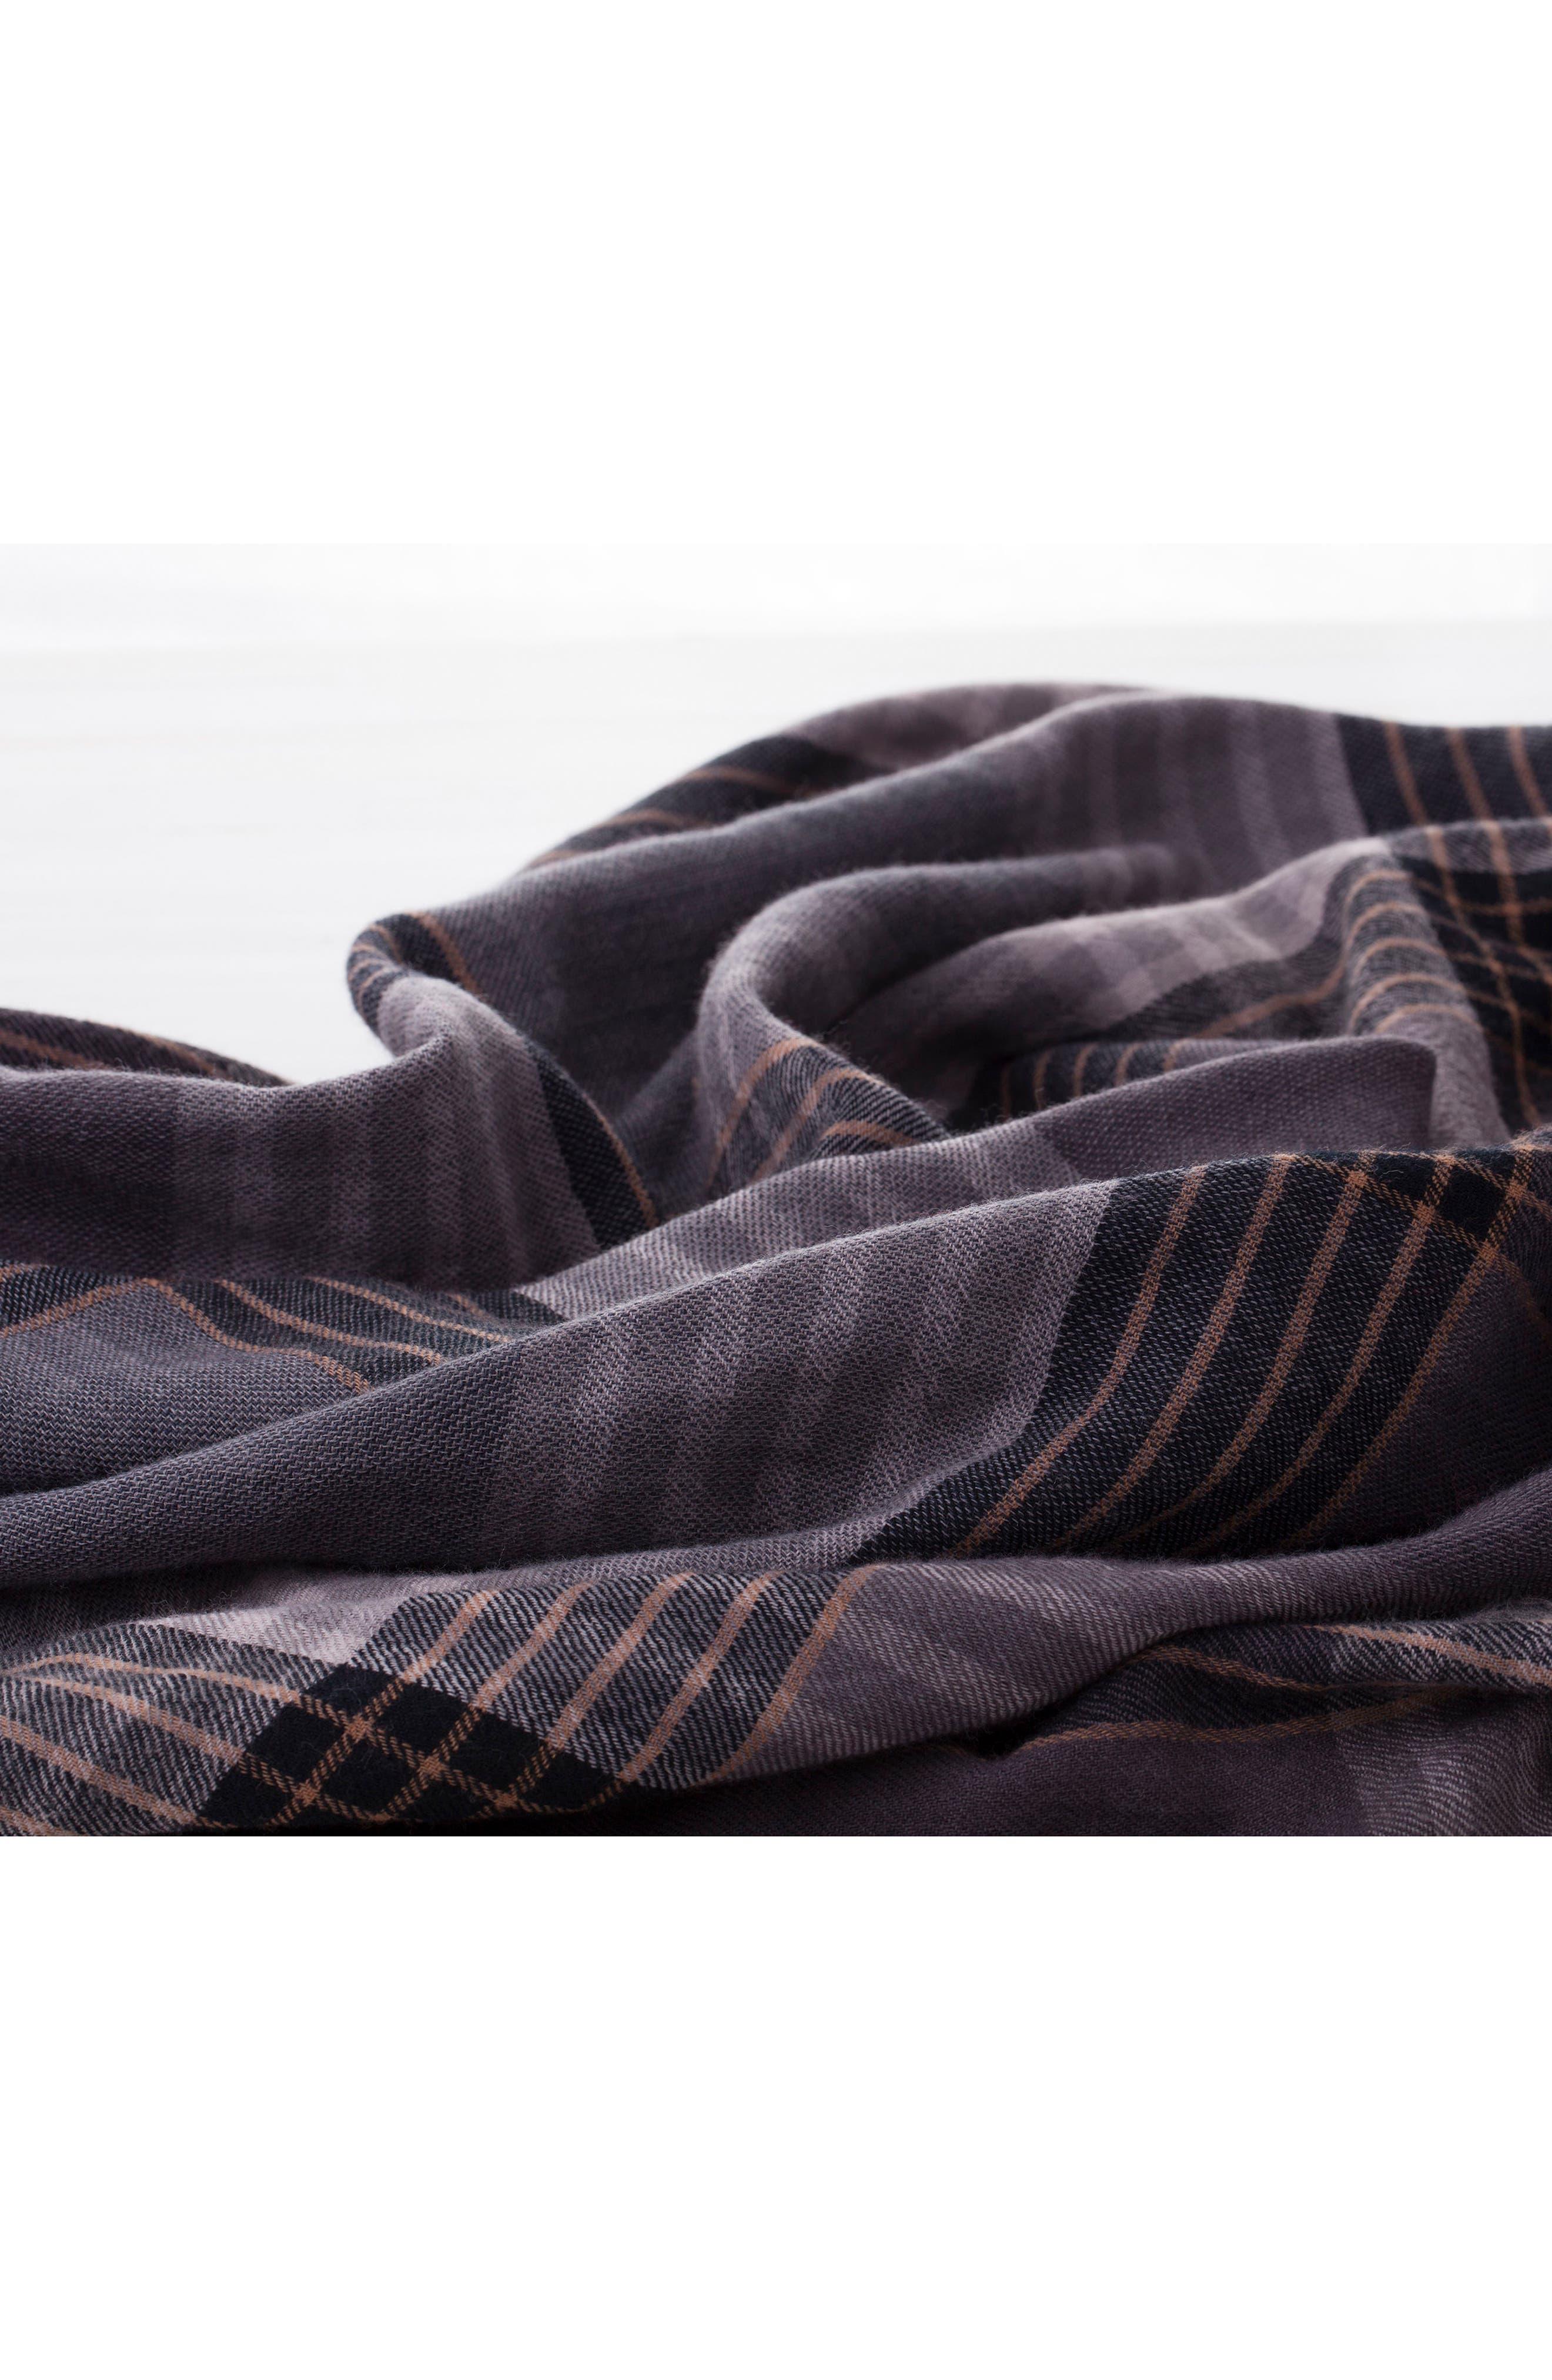 MODERN STAPLES,                             Plaid Double Face Merino Wool Throw,                             Alternate thumbnail 3, color,                             060